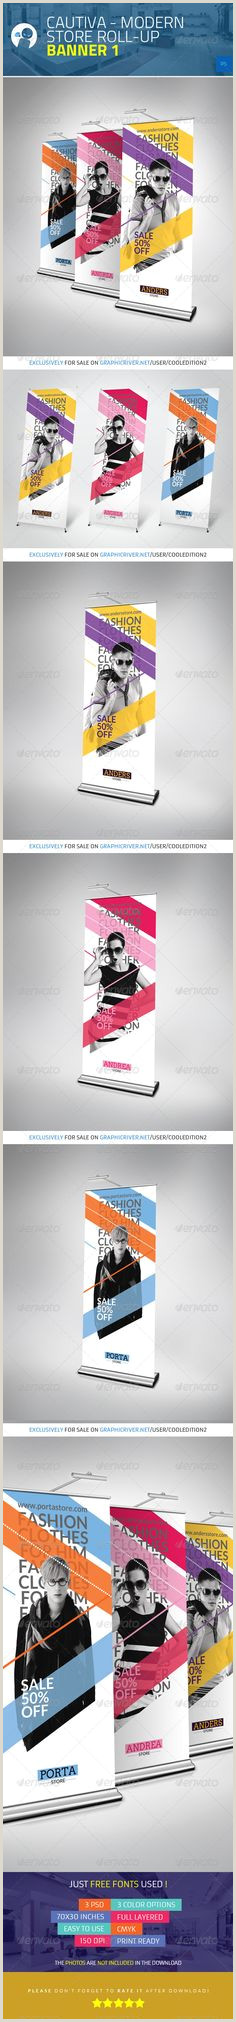 Print Roll Up Banner 40 Mejores Imágenes De Roll Up Banner